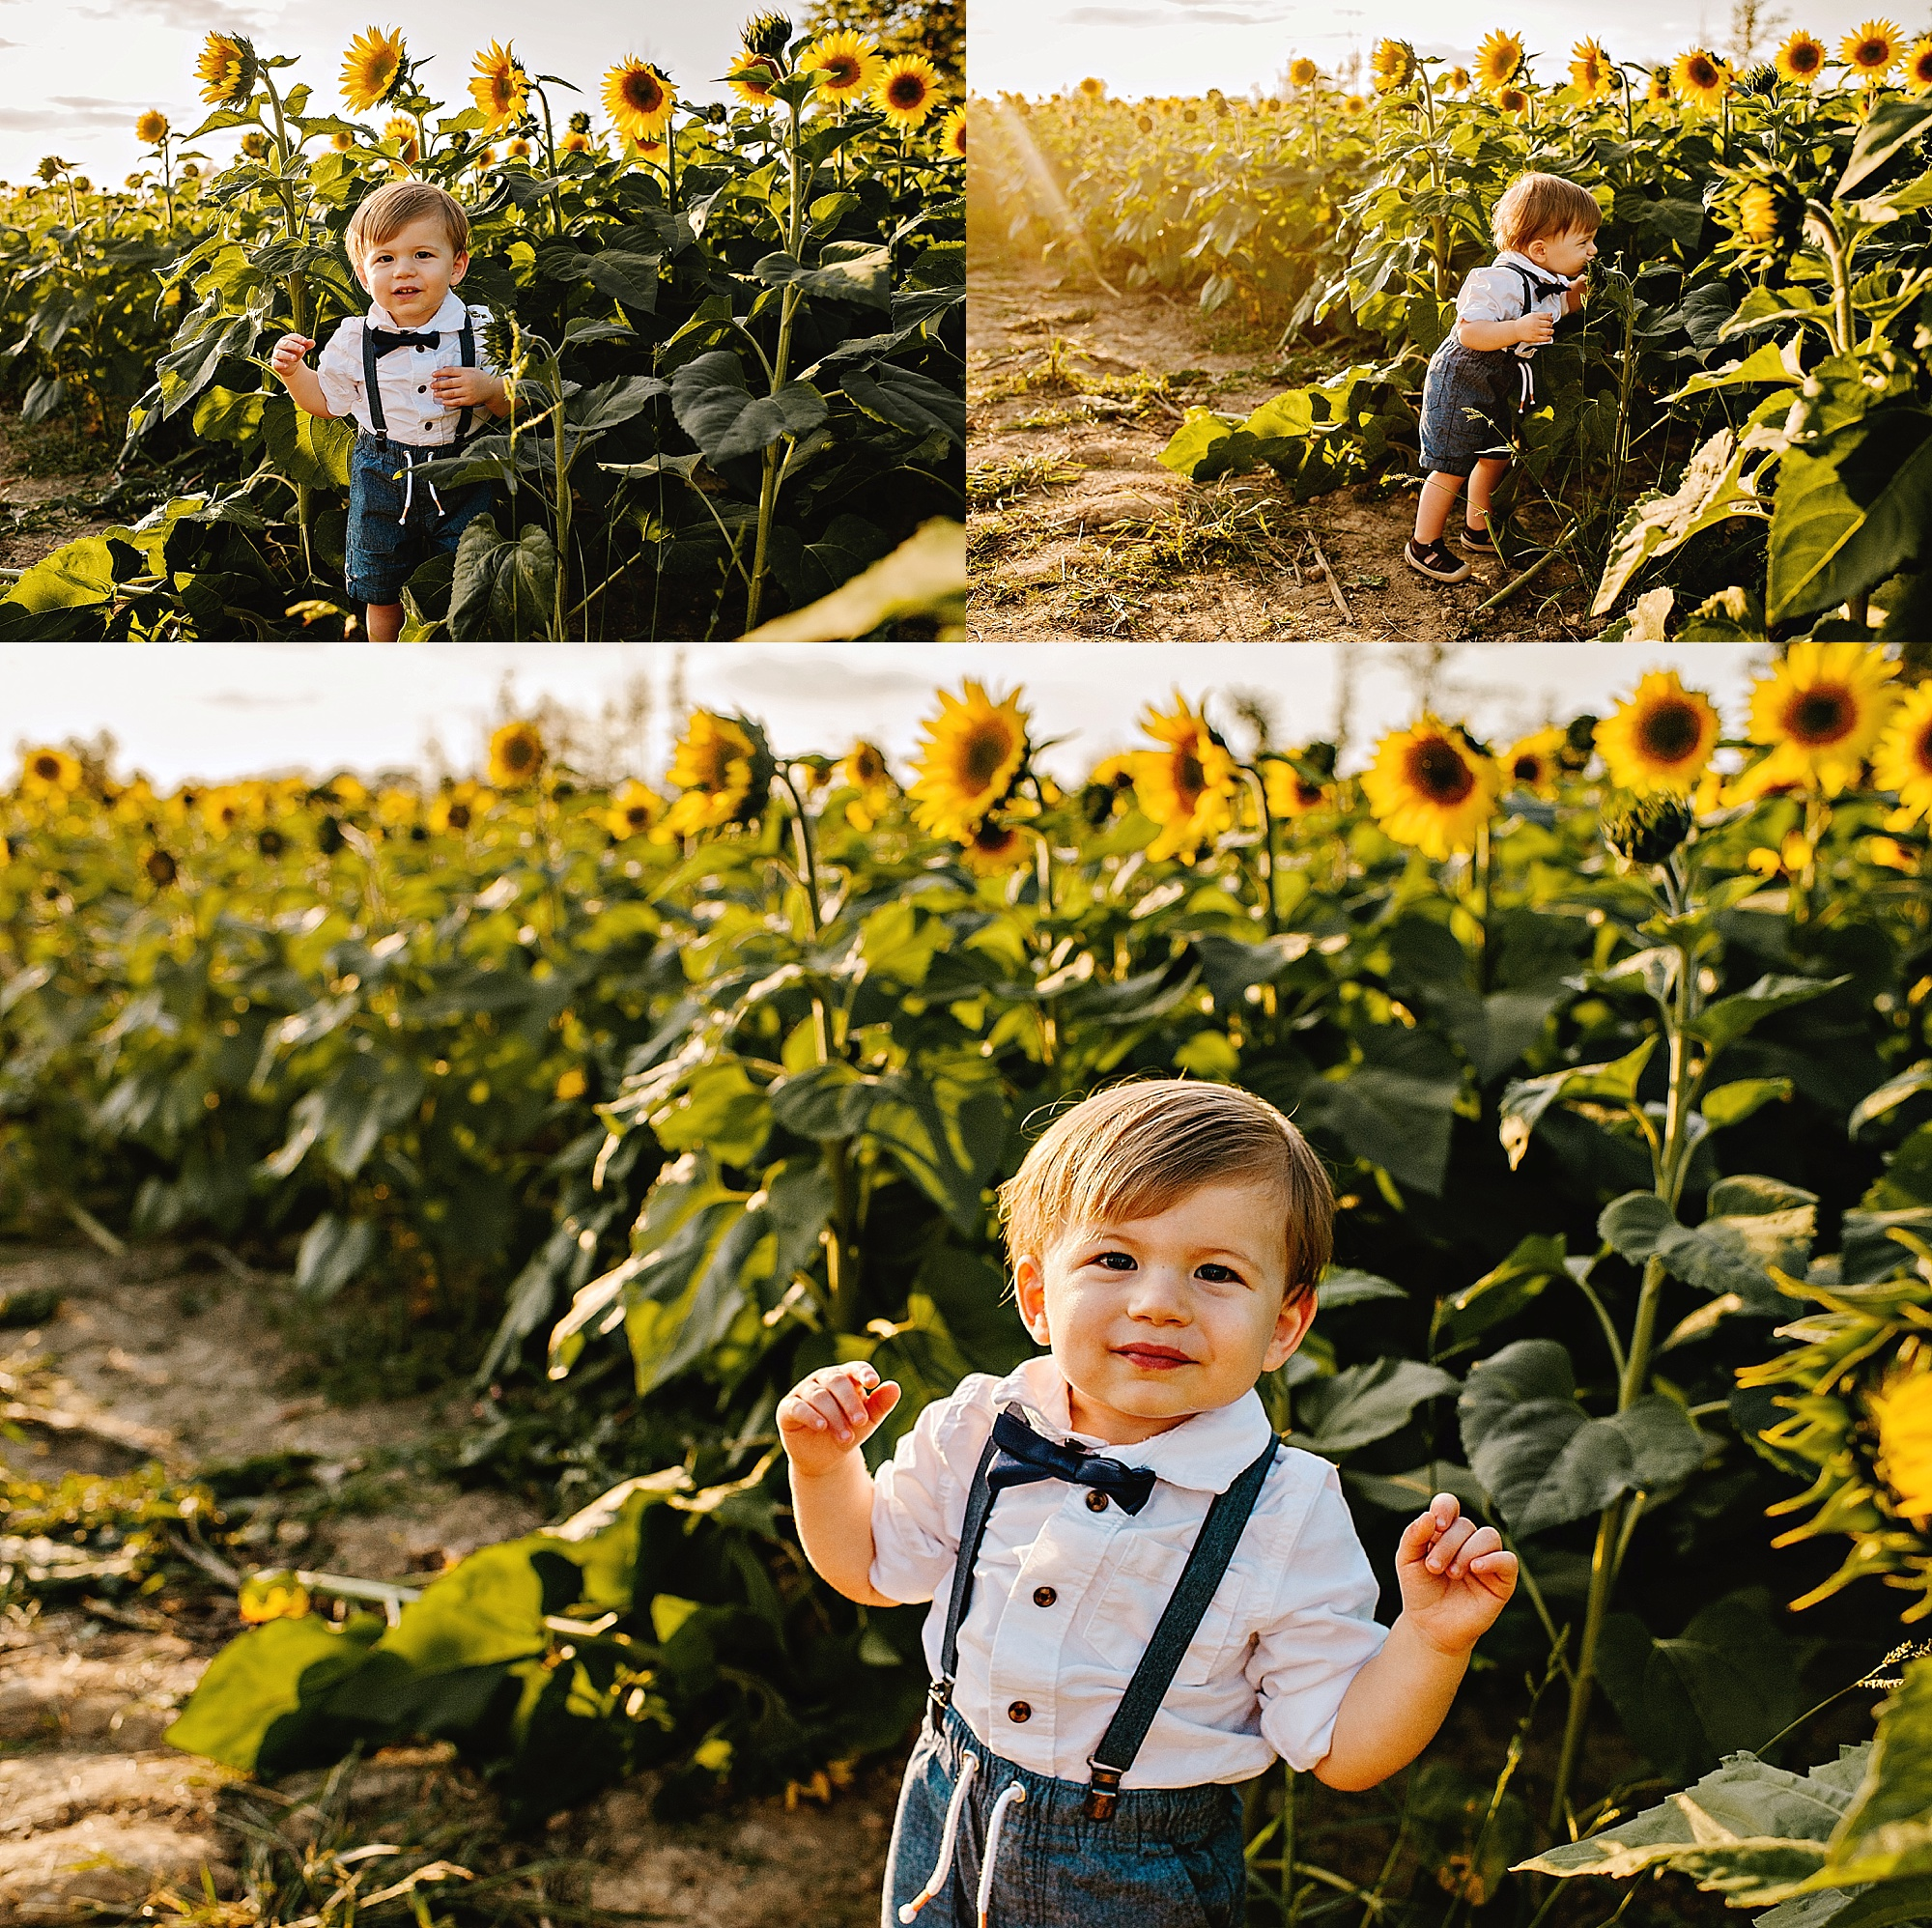 Schreiner-family-lauren-grayson-cleveland-photographer-sunflower-field-session_0002.jpg